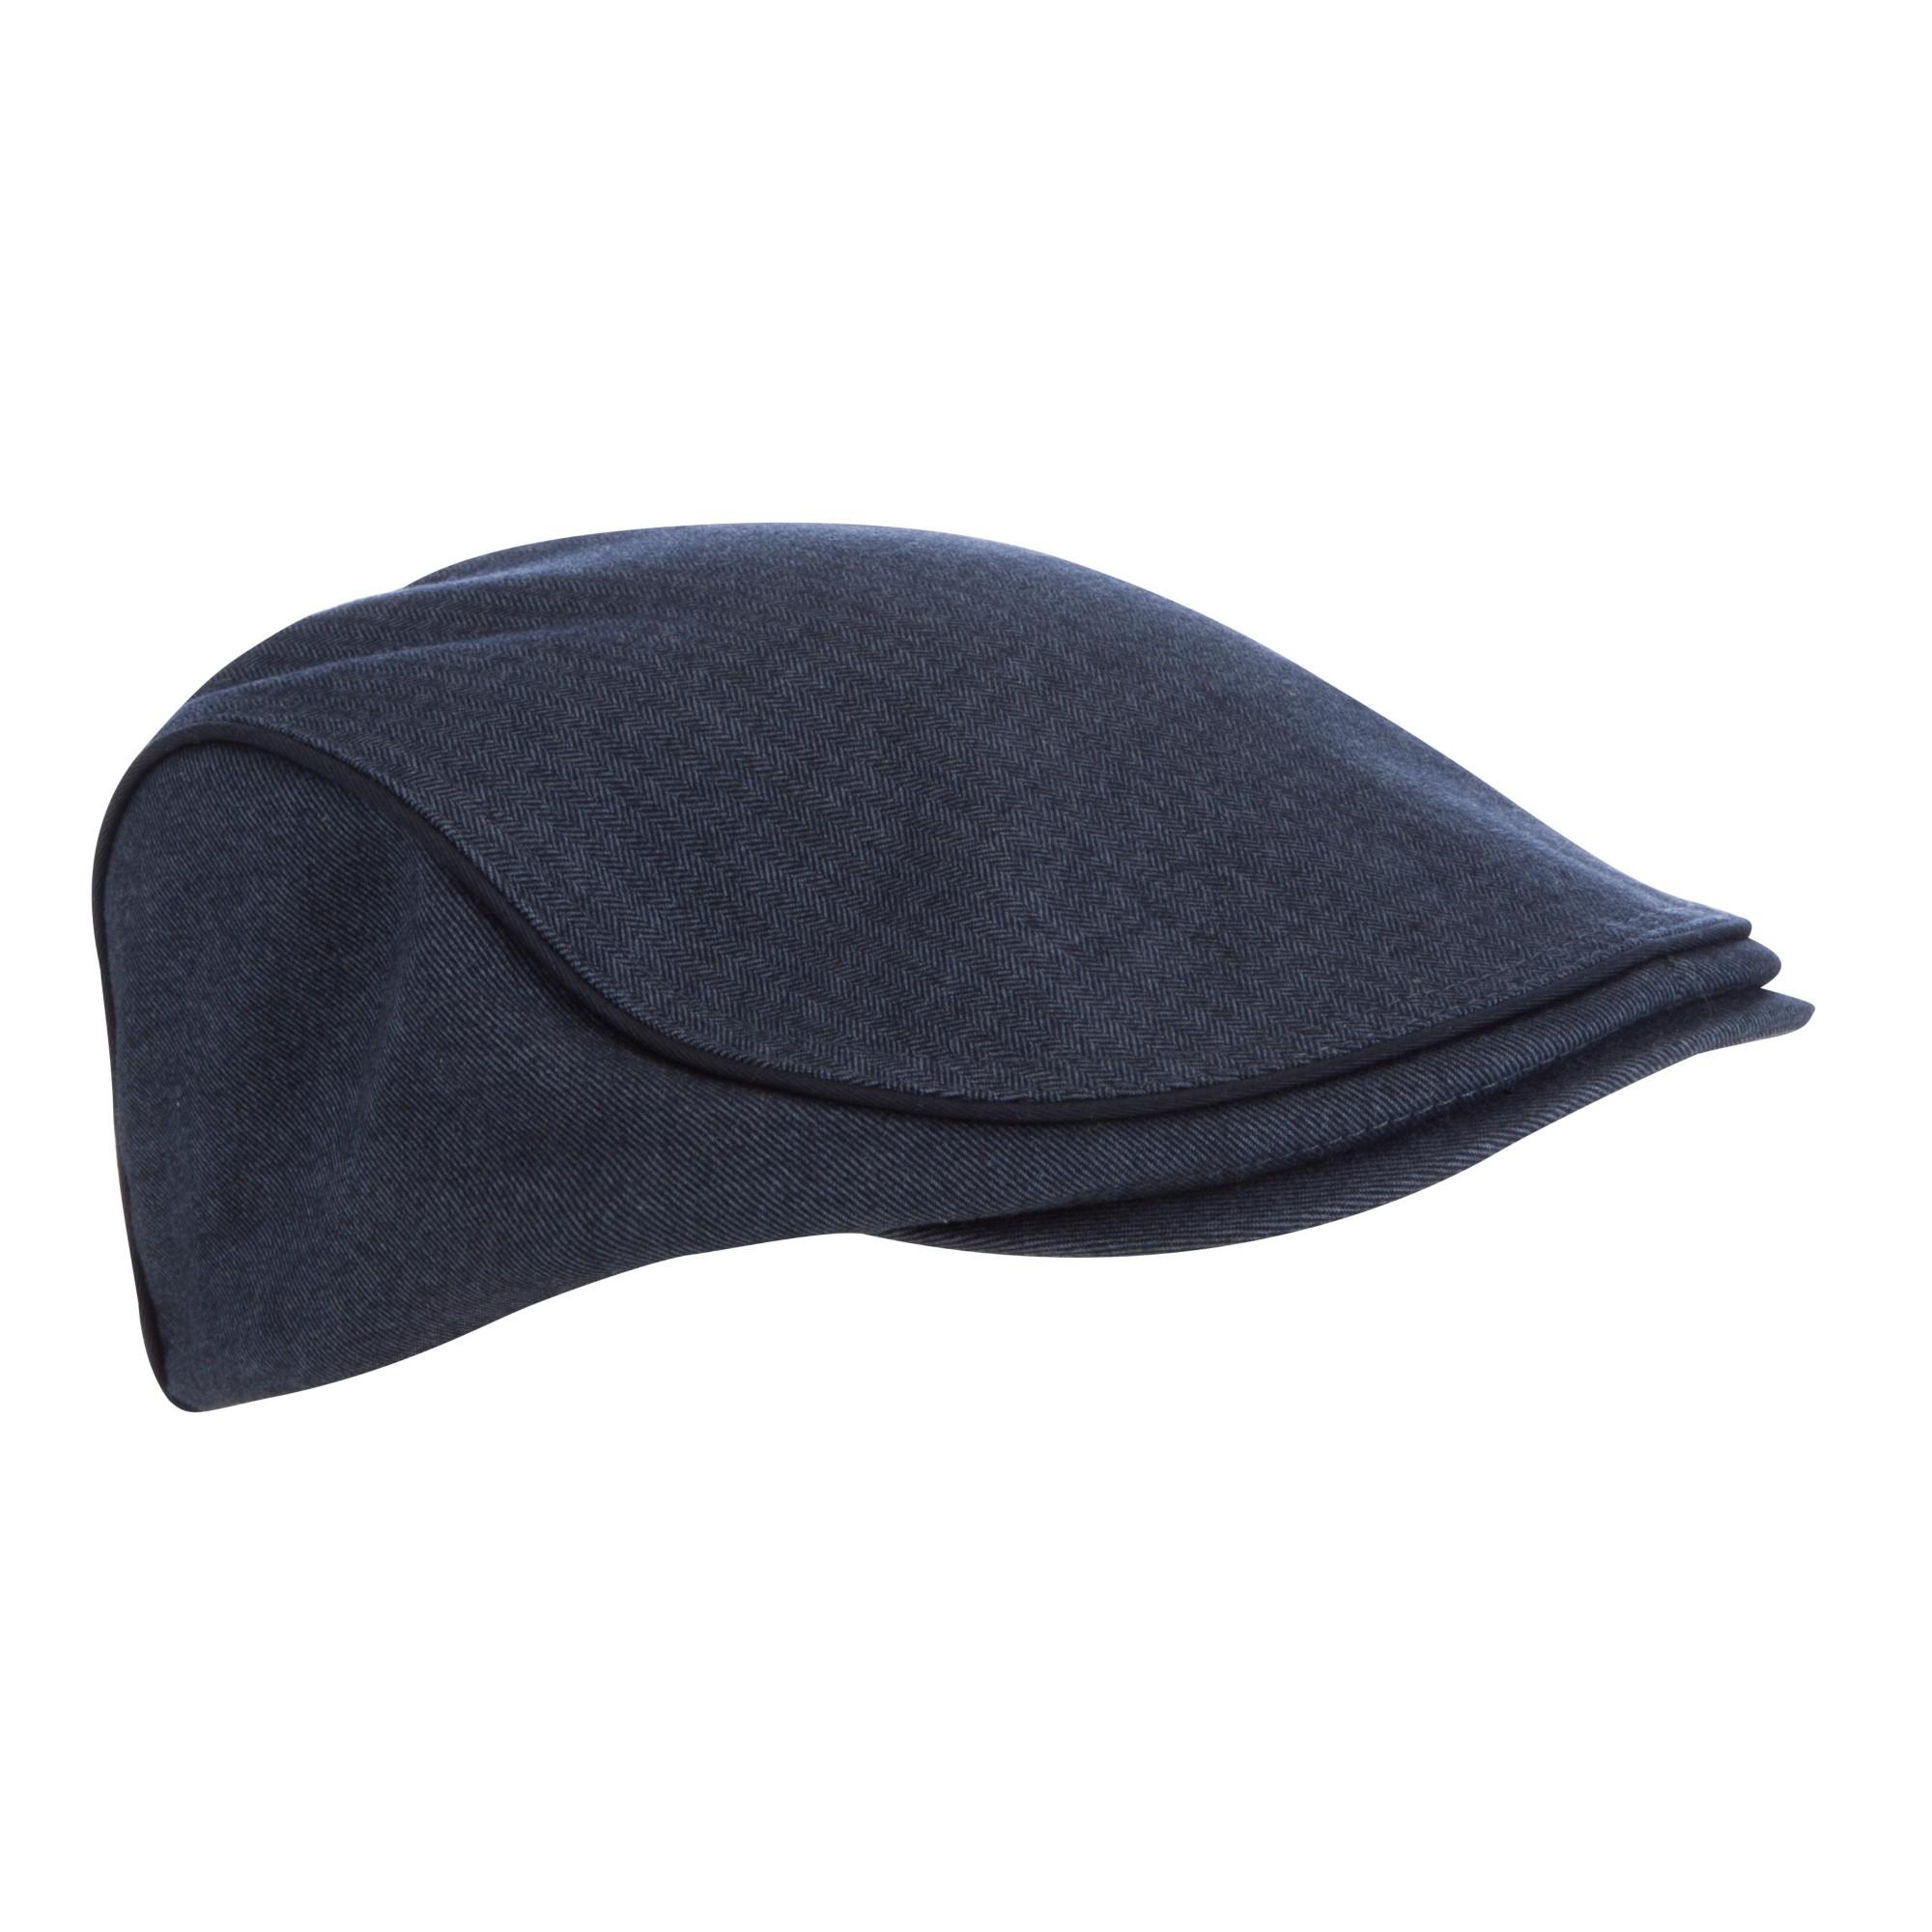 35e2177bfbe Ted Baker Pherlop Cotton Herringbone Flat Cap in Blue for Men - Lyst